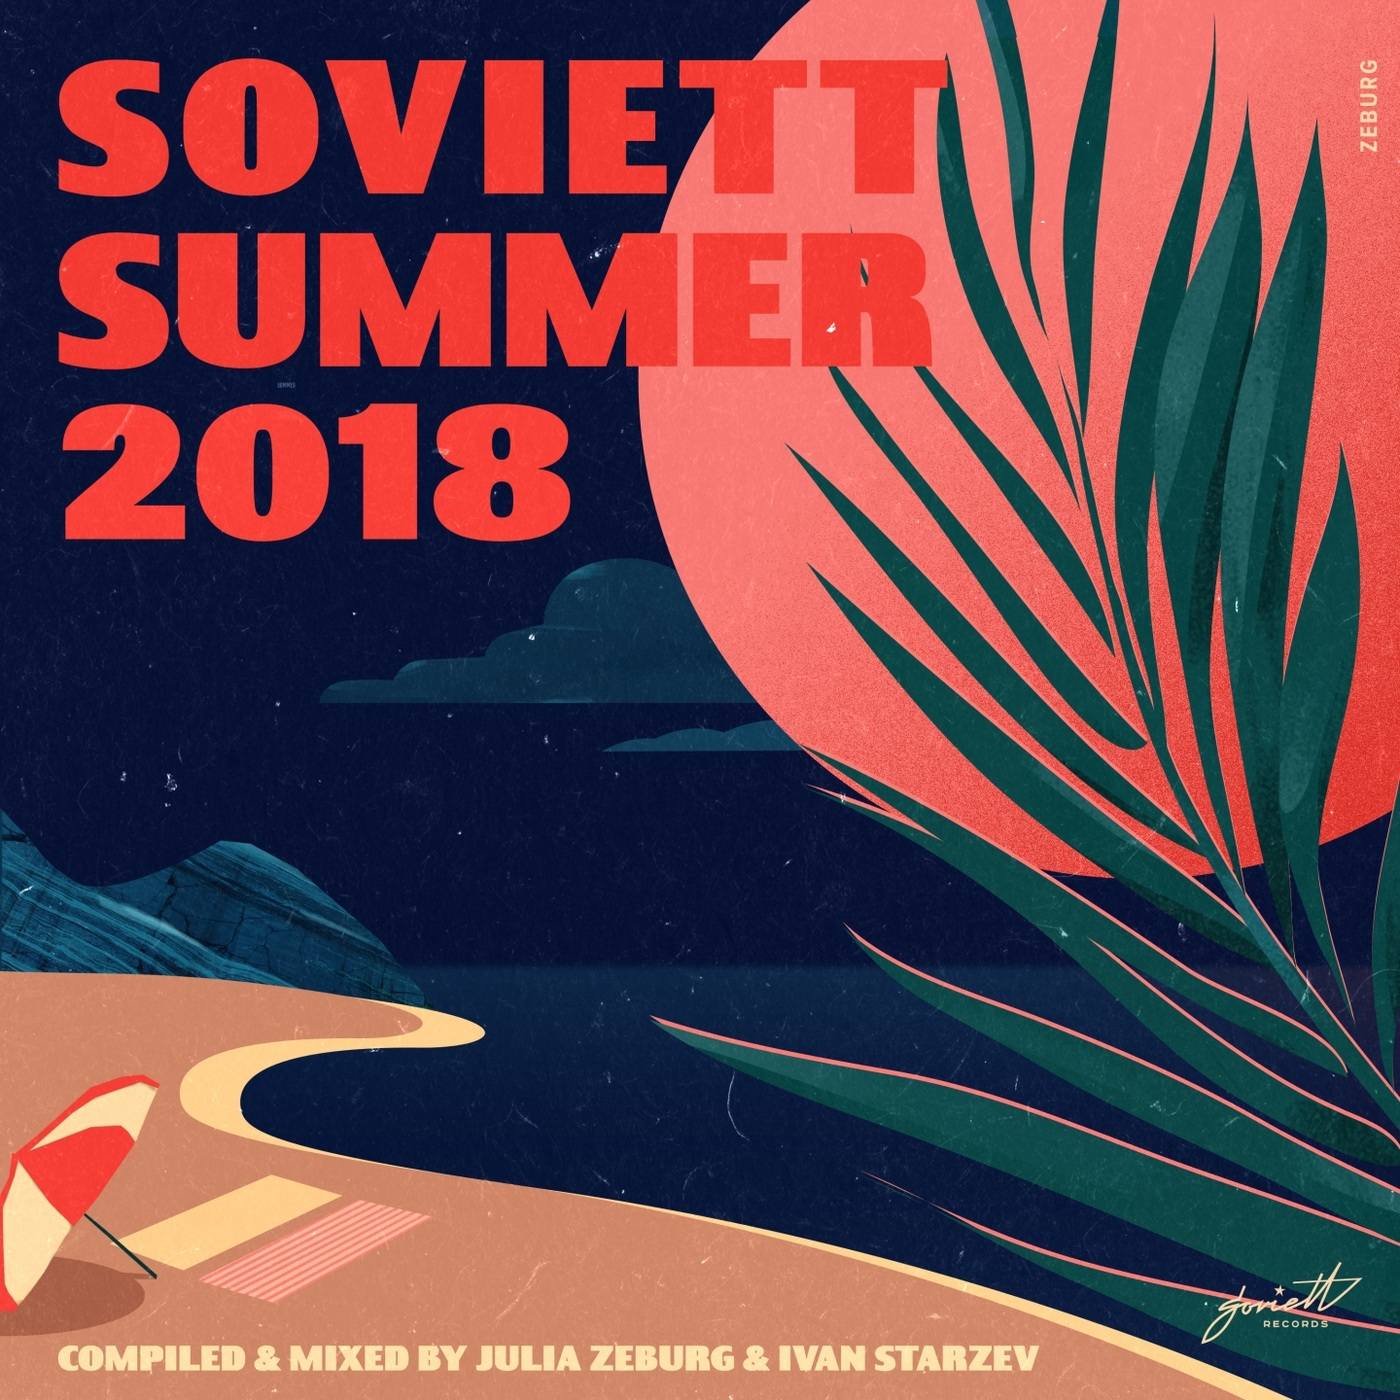 Brat\'ya - Someplace New  (Kly Remix)